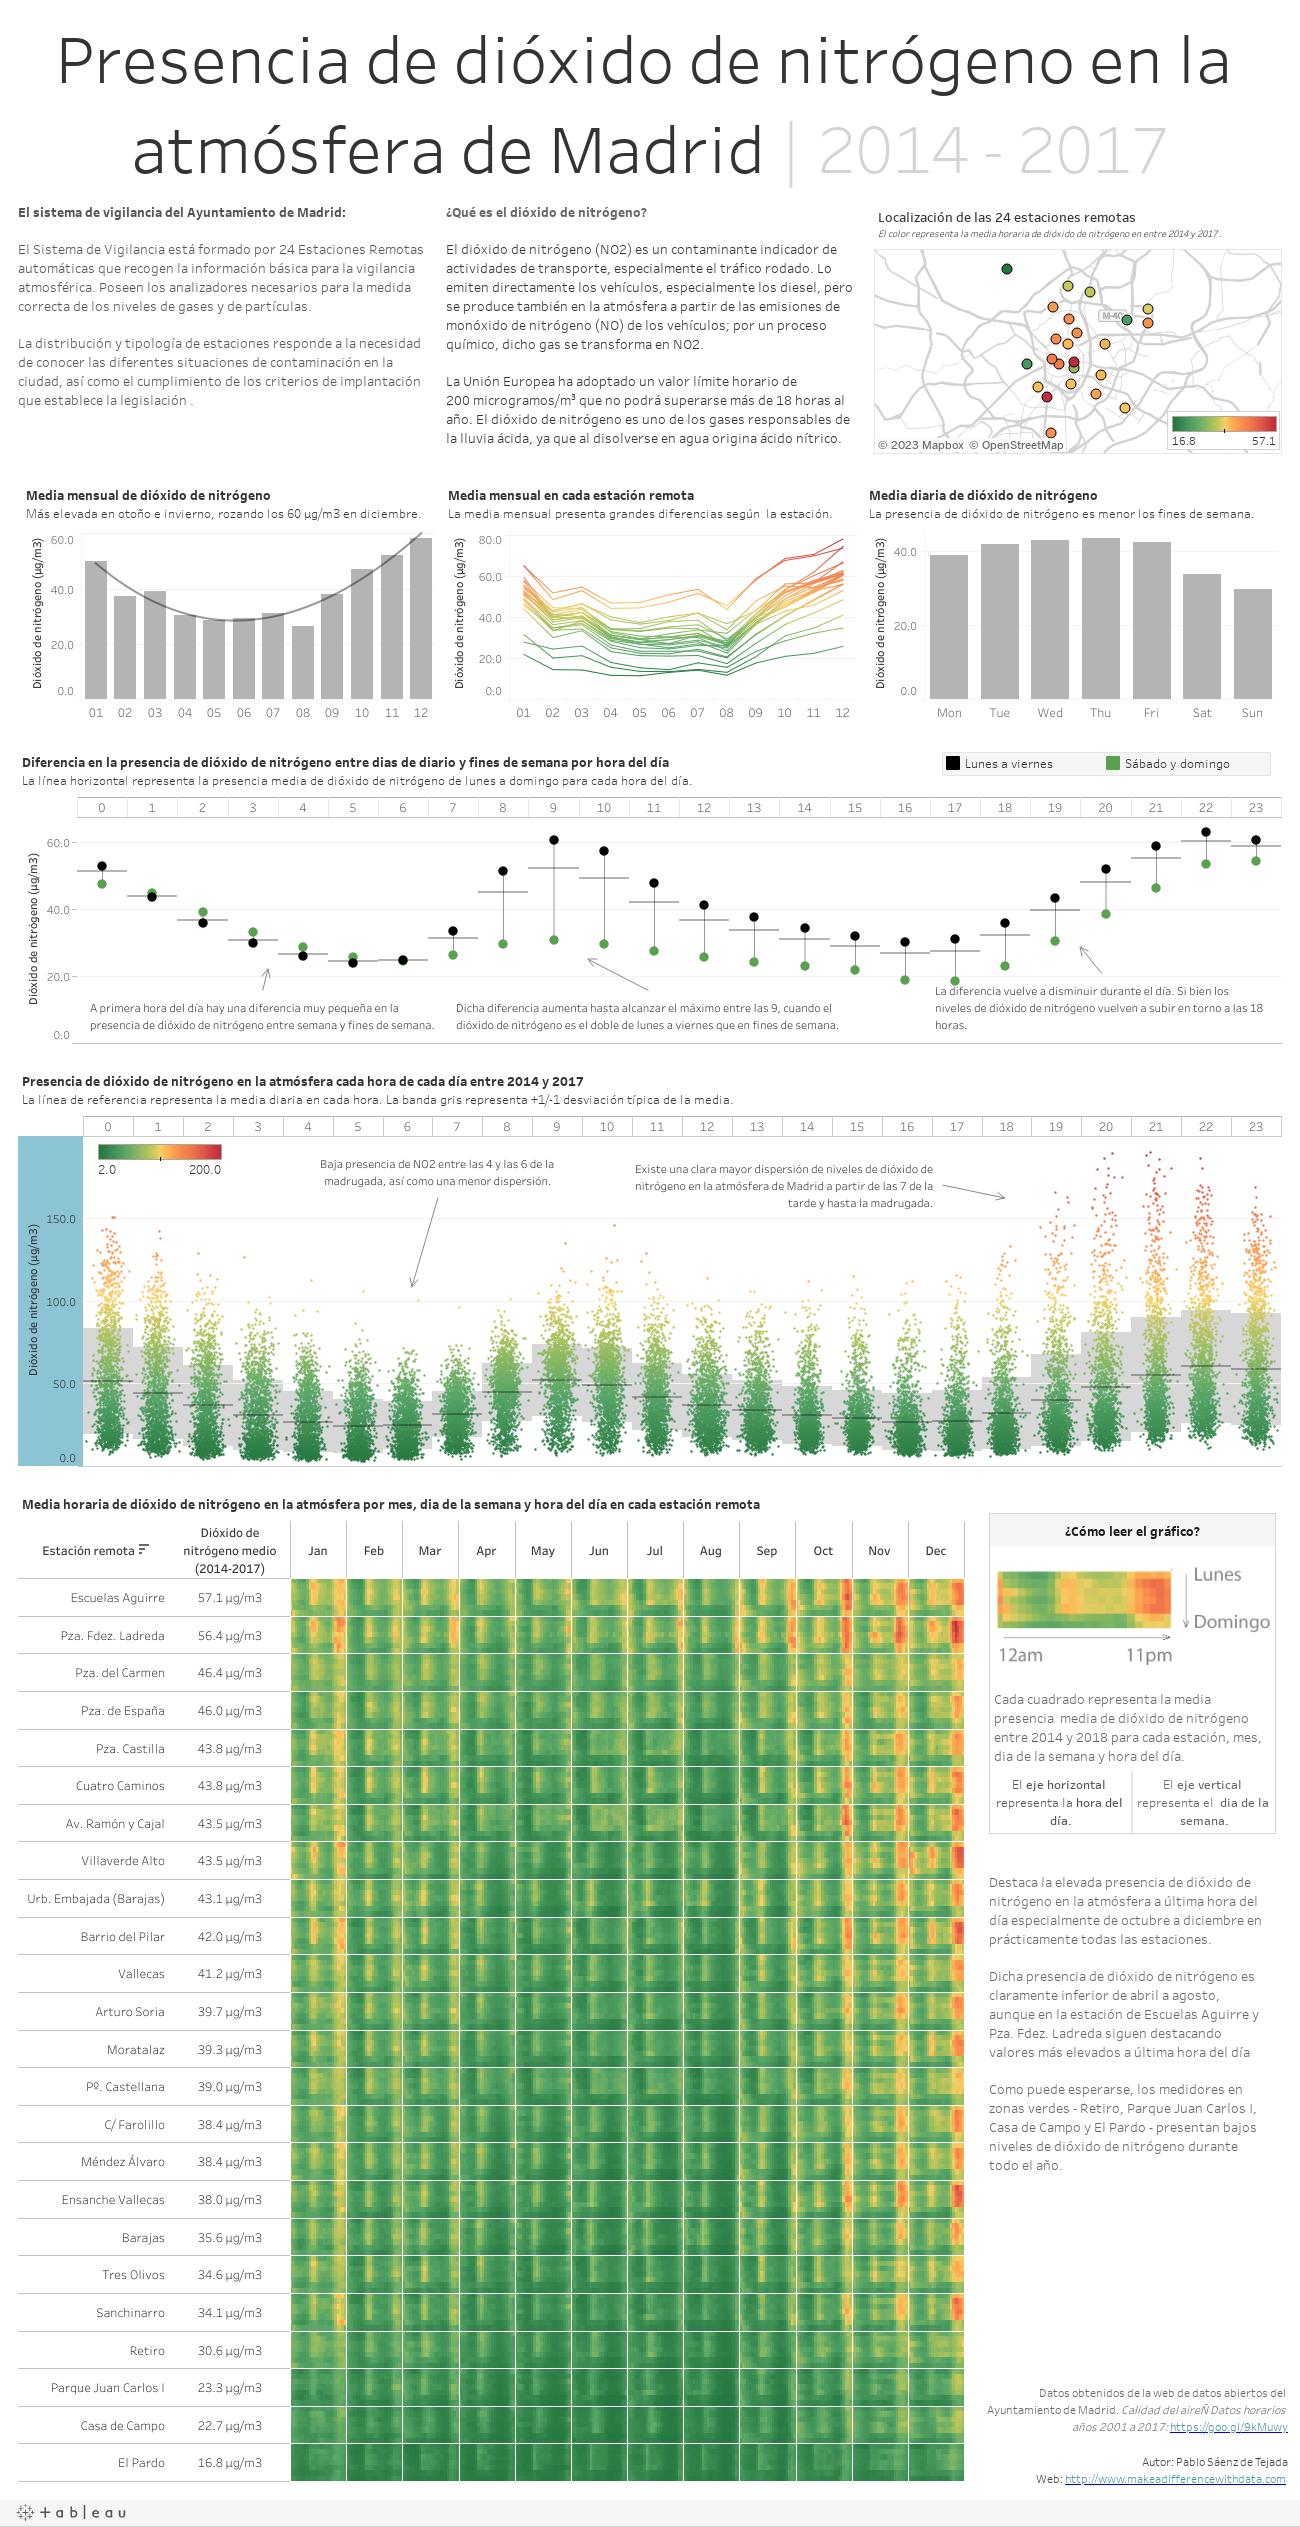 Presencia de dióxido de nitrógeno en la atmósfera de Madrid | 2014 - 2017